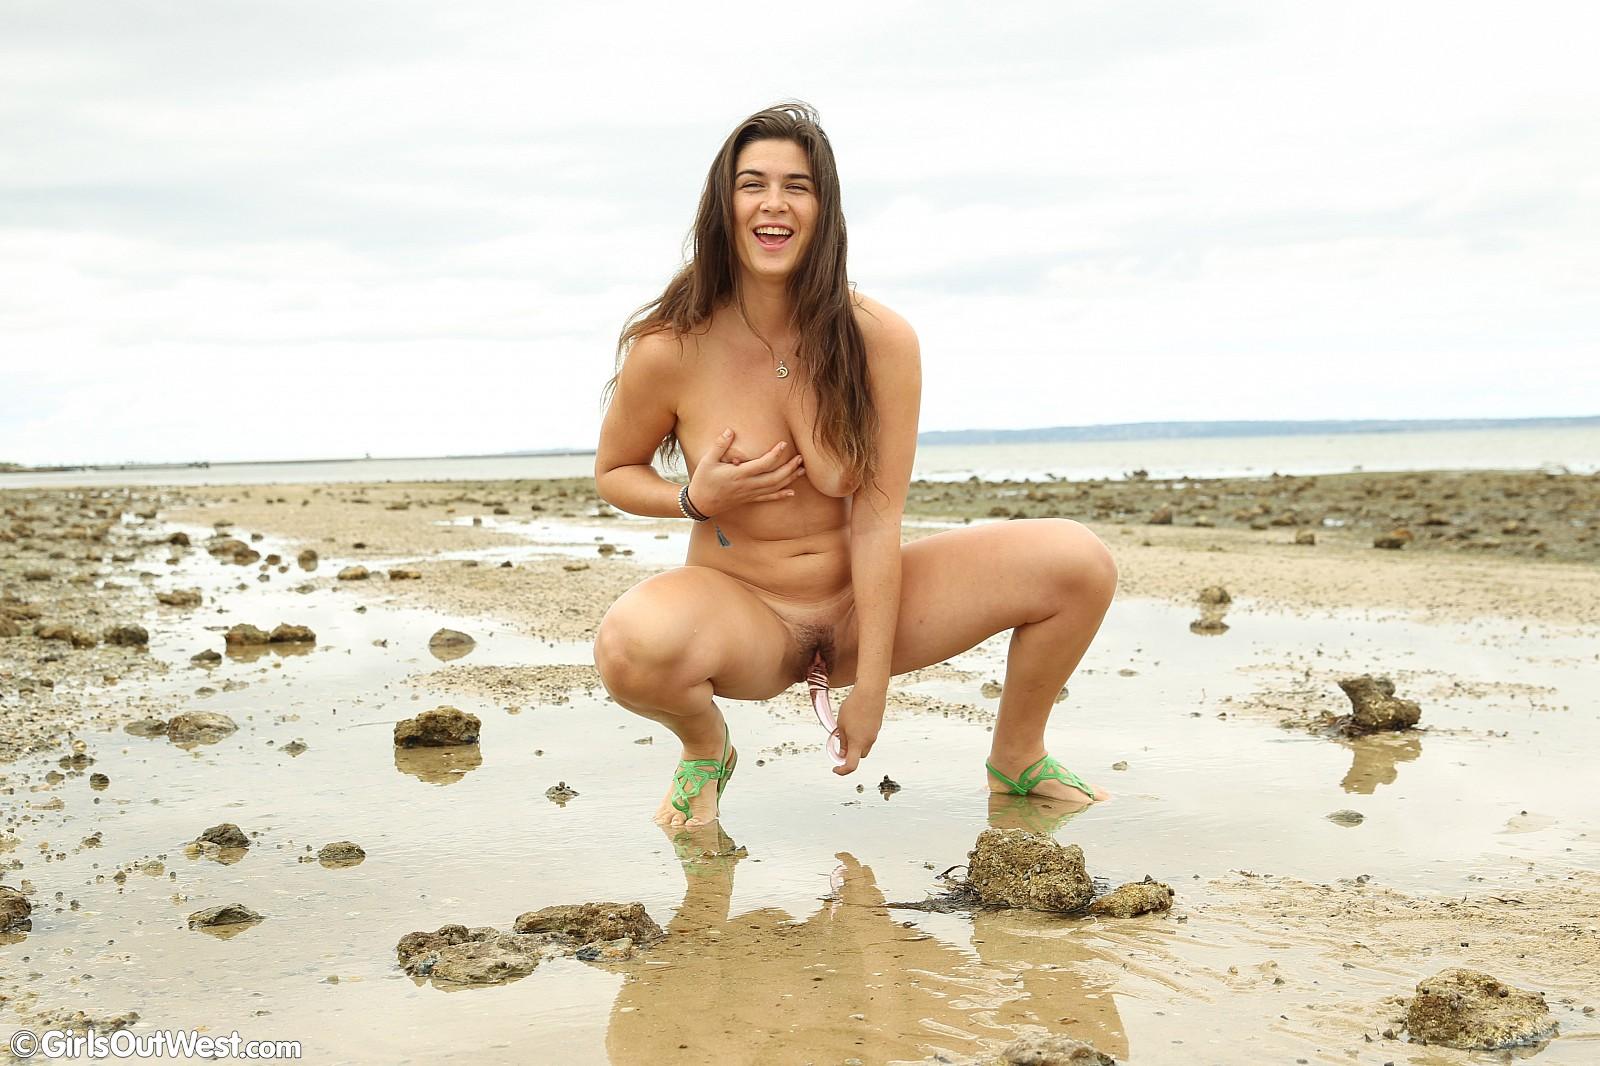 Lesbiansex Pictures